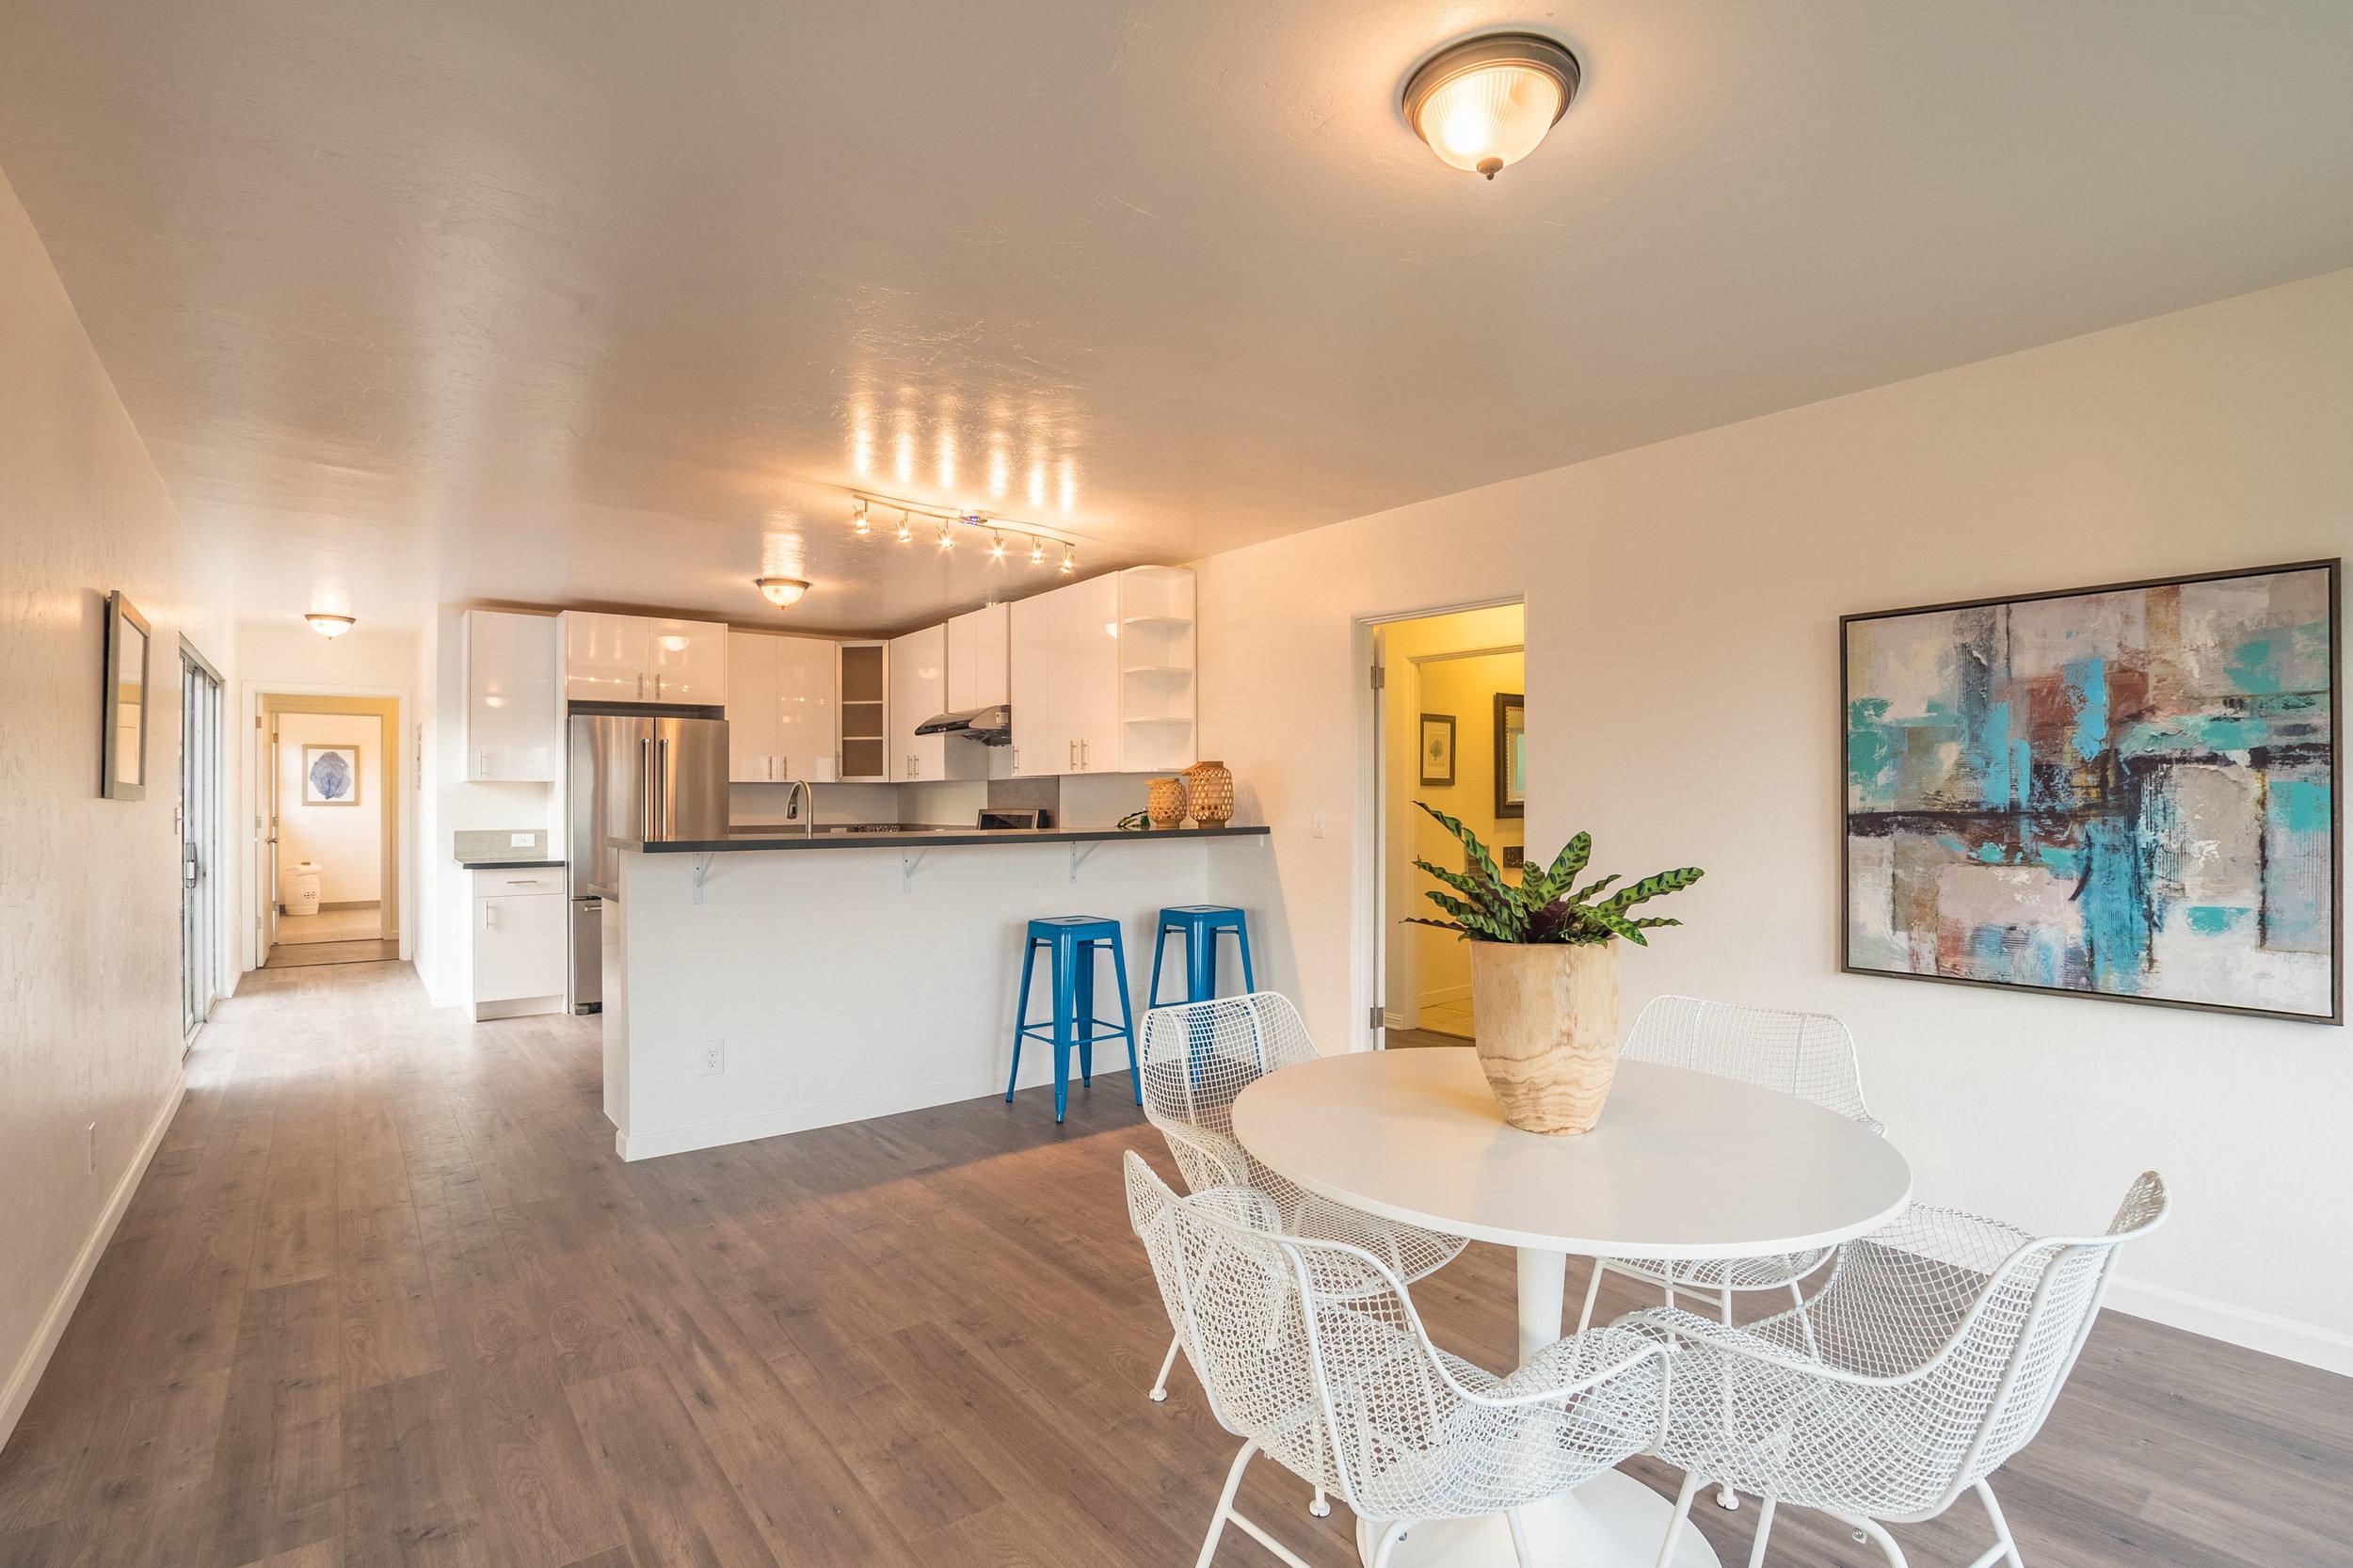 Large 3 Bedroom Home in Santa Cruz, California